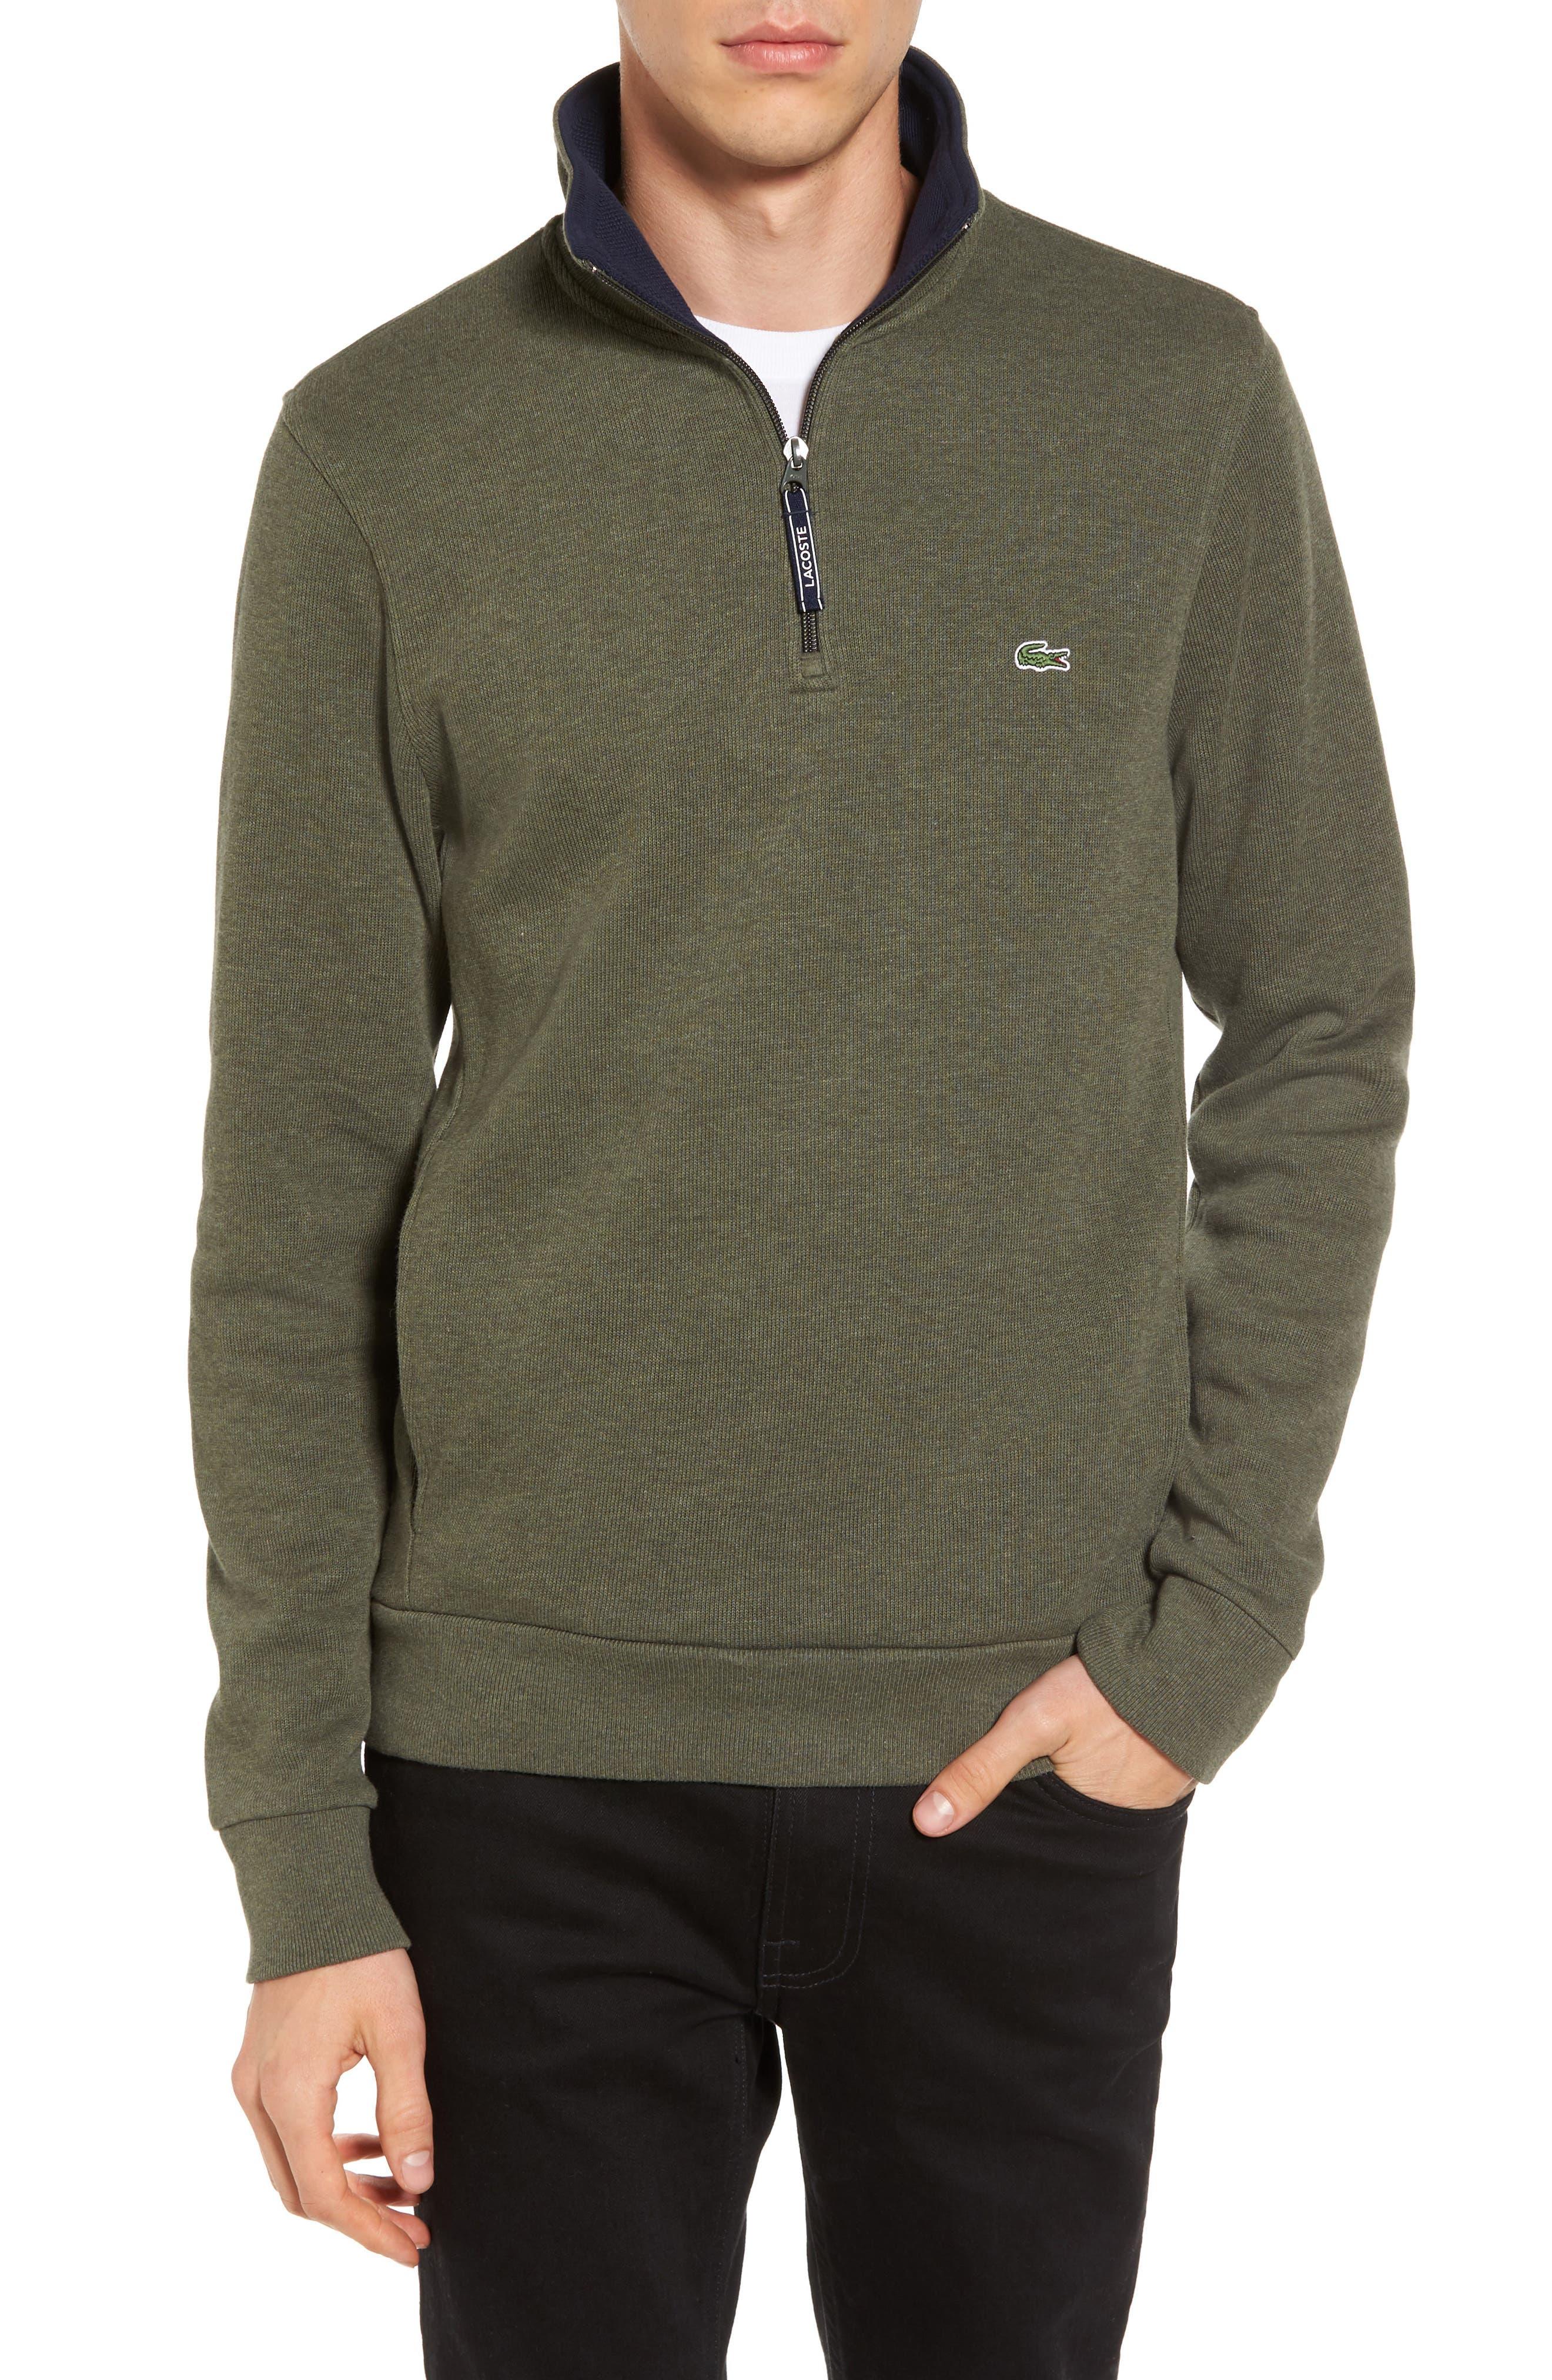 Quarter Zip Sweatshirt,                         Main,                         color, 2Qh Army/ Navy Blue